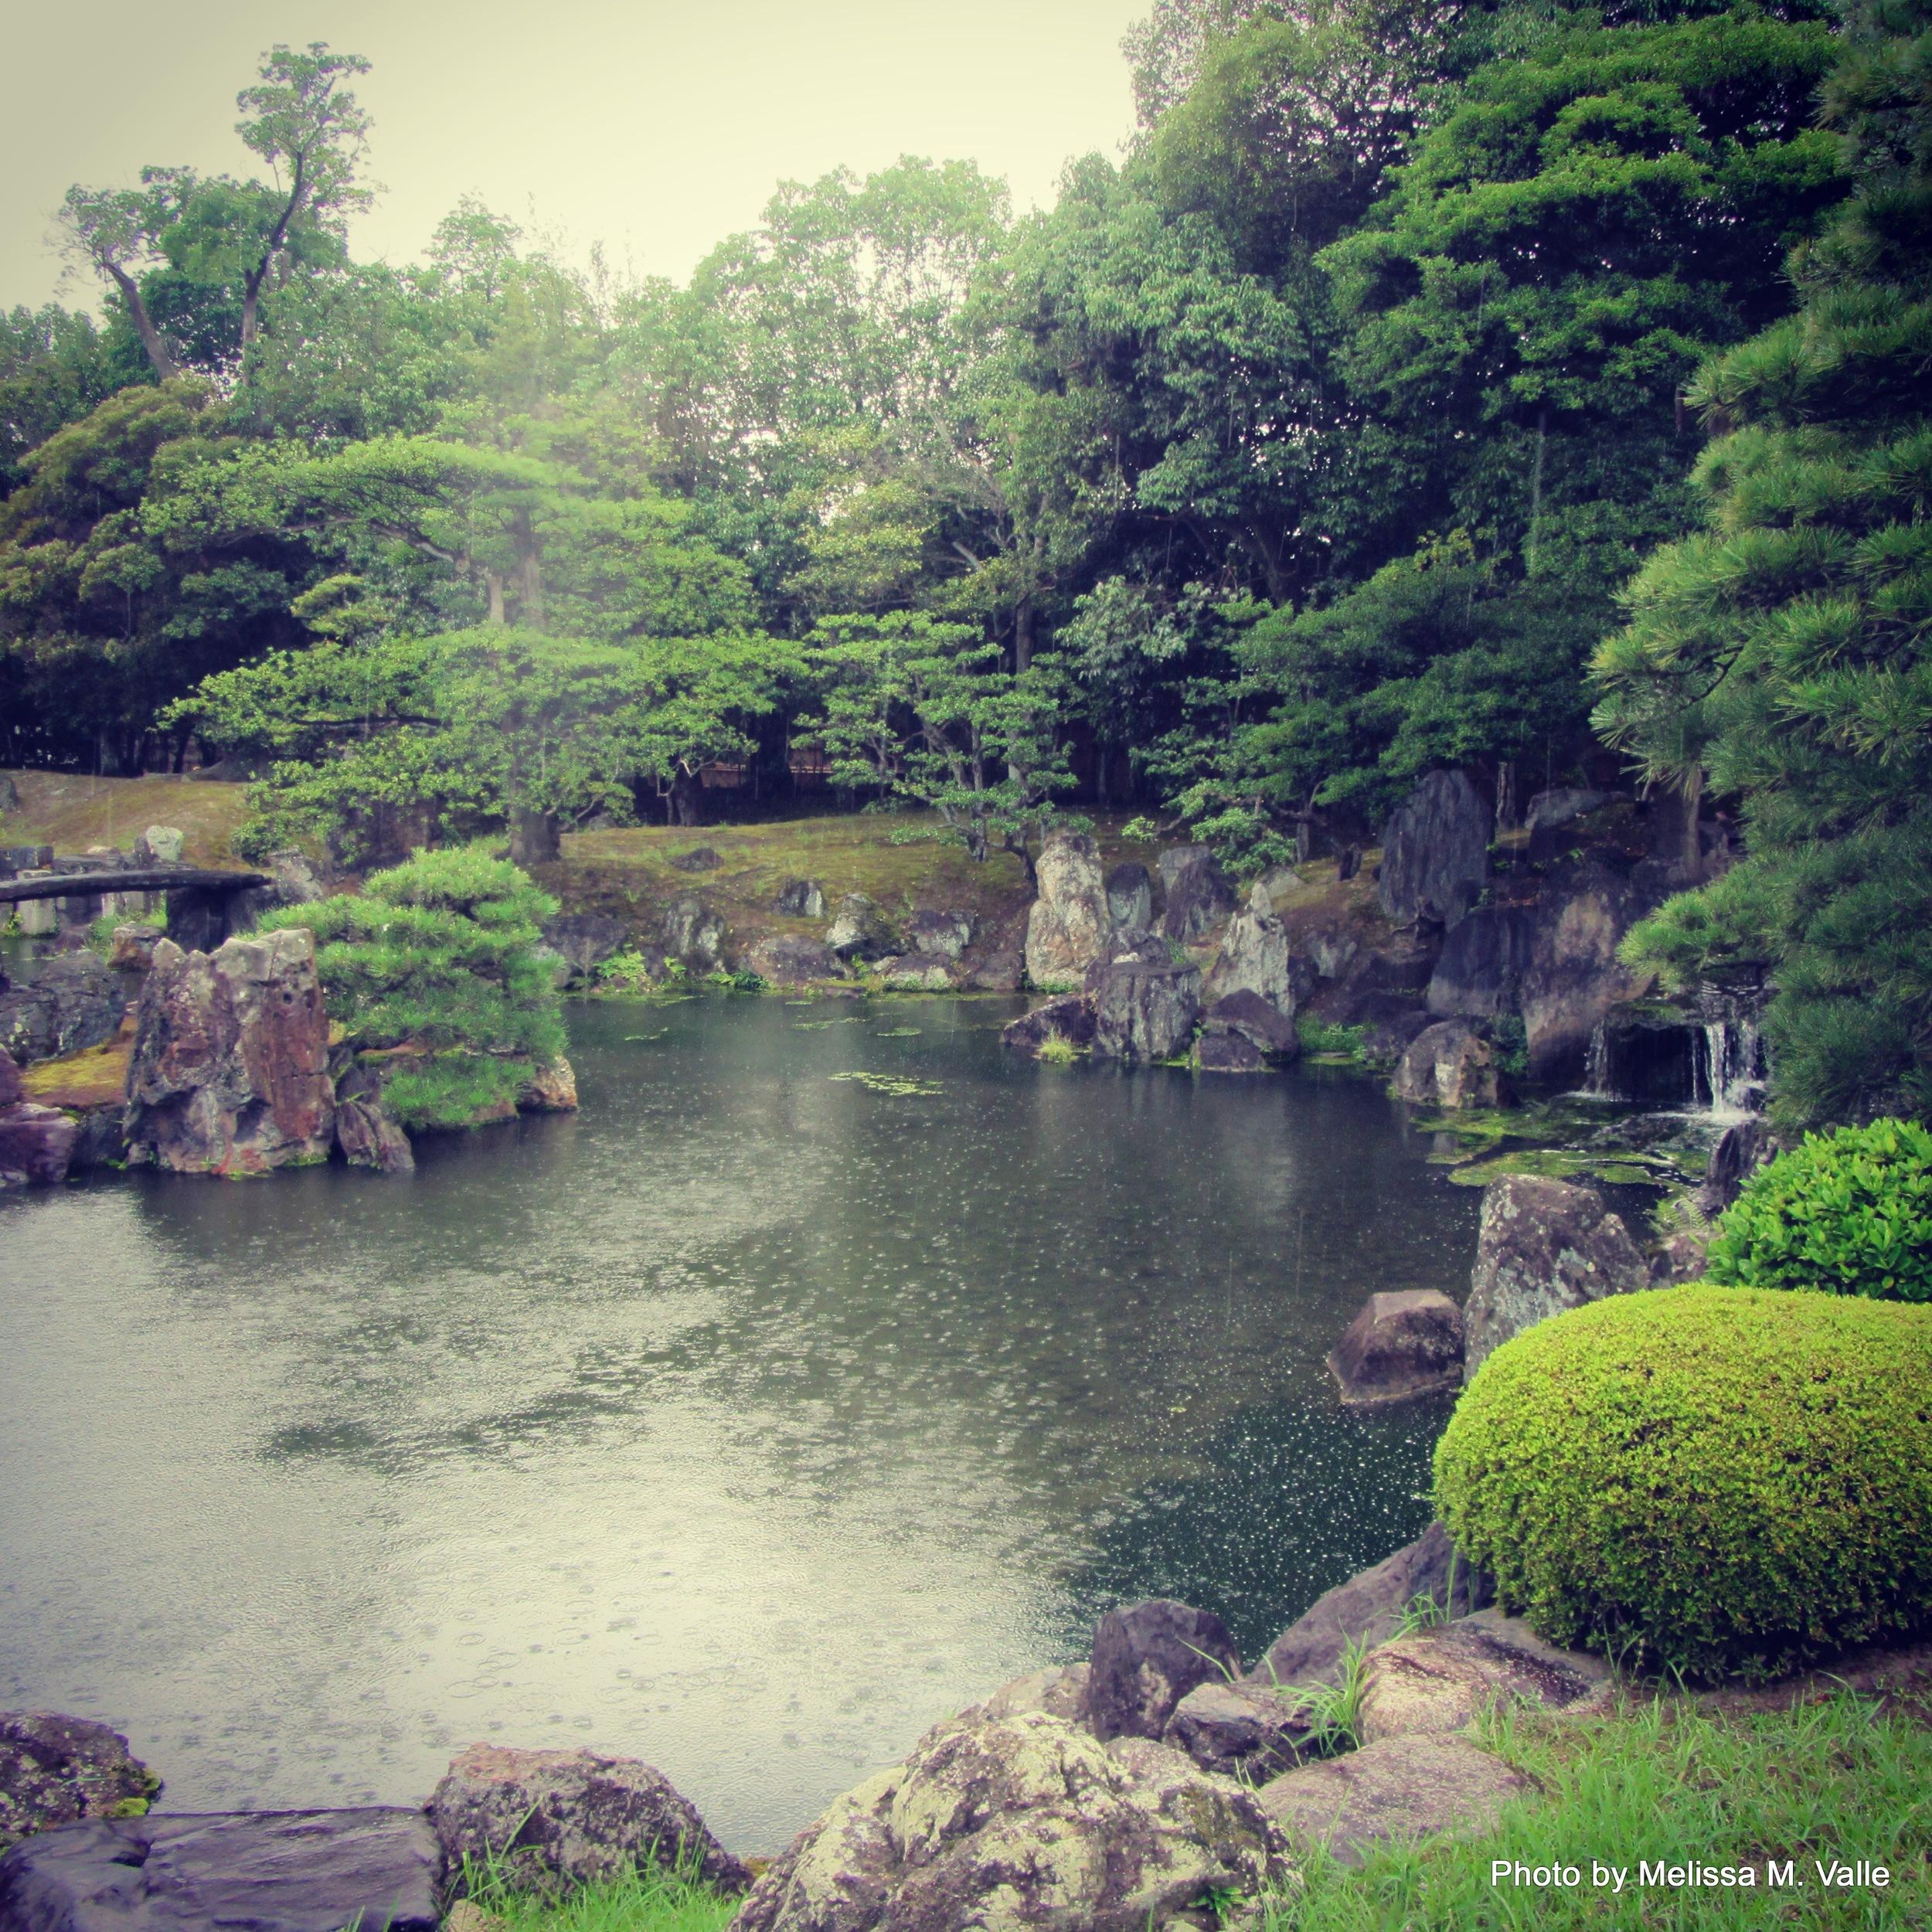 7.19.14 Kyoto, Japan-Nijō Castle (15) IG.JPG